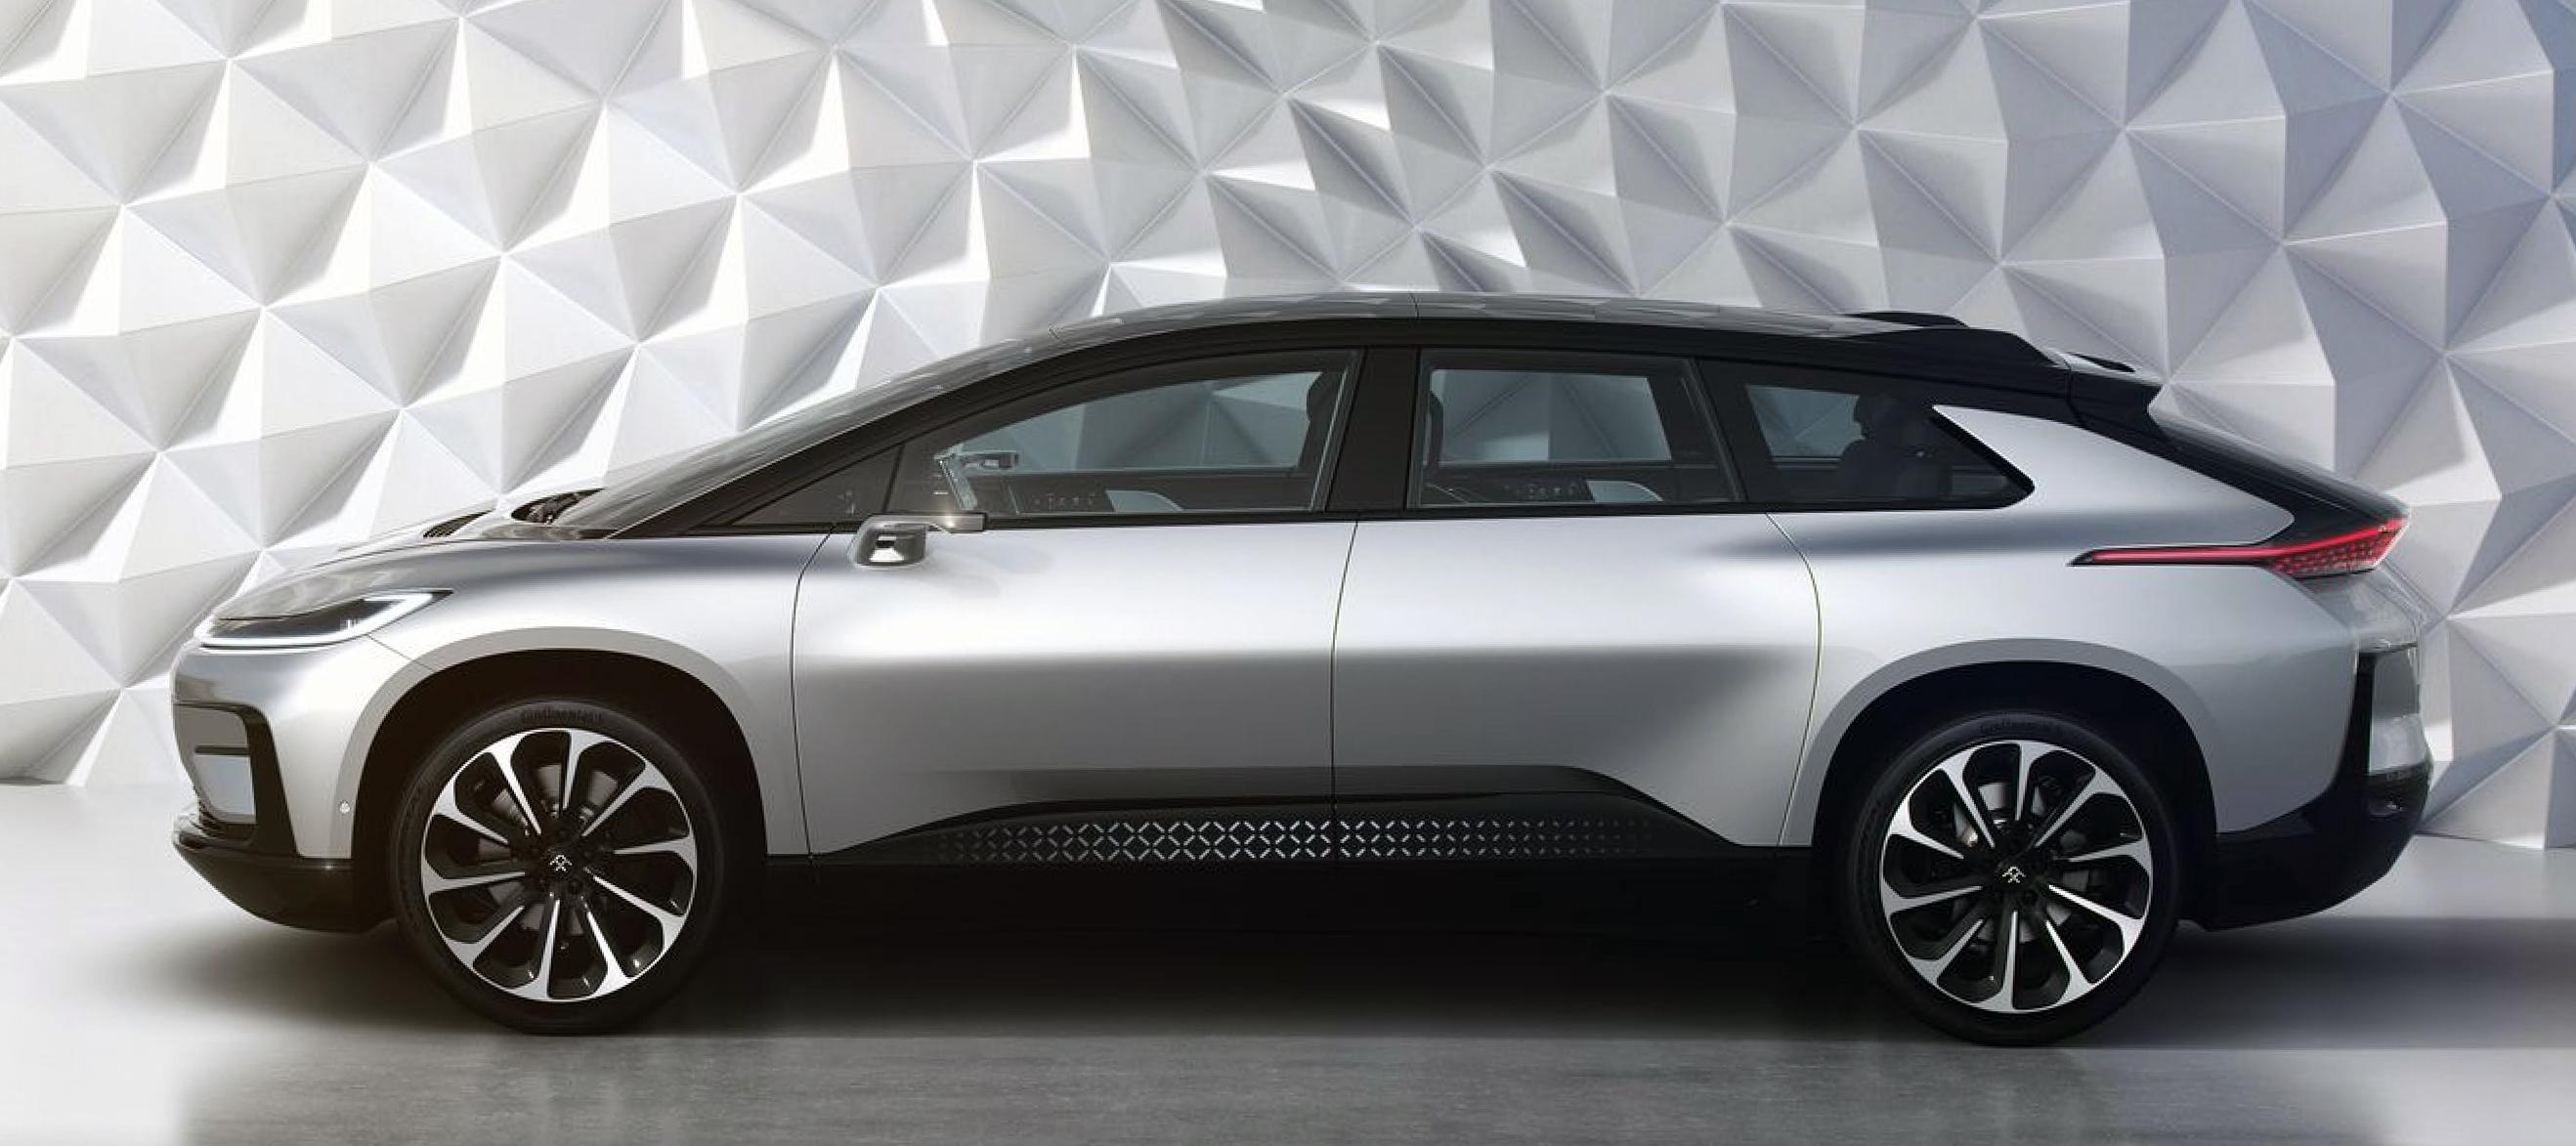 ff91 concept car